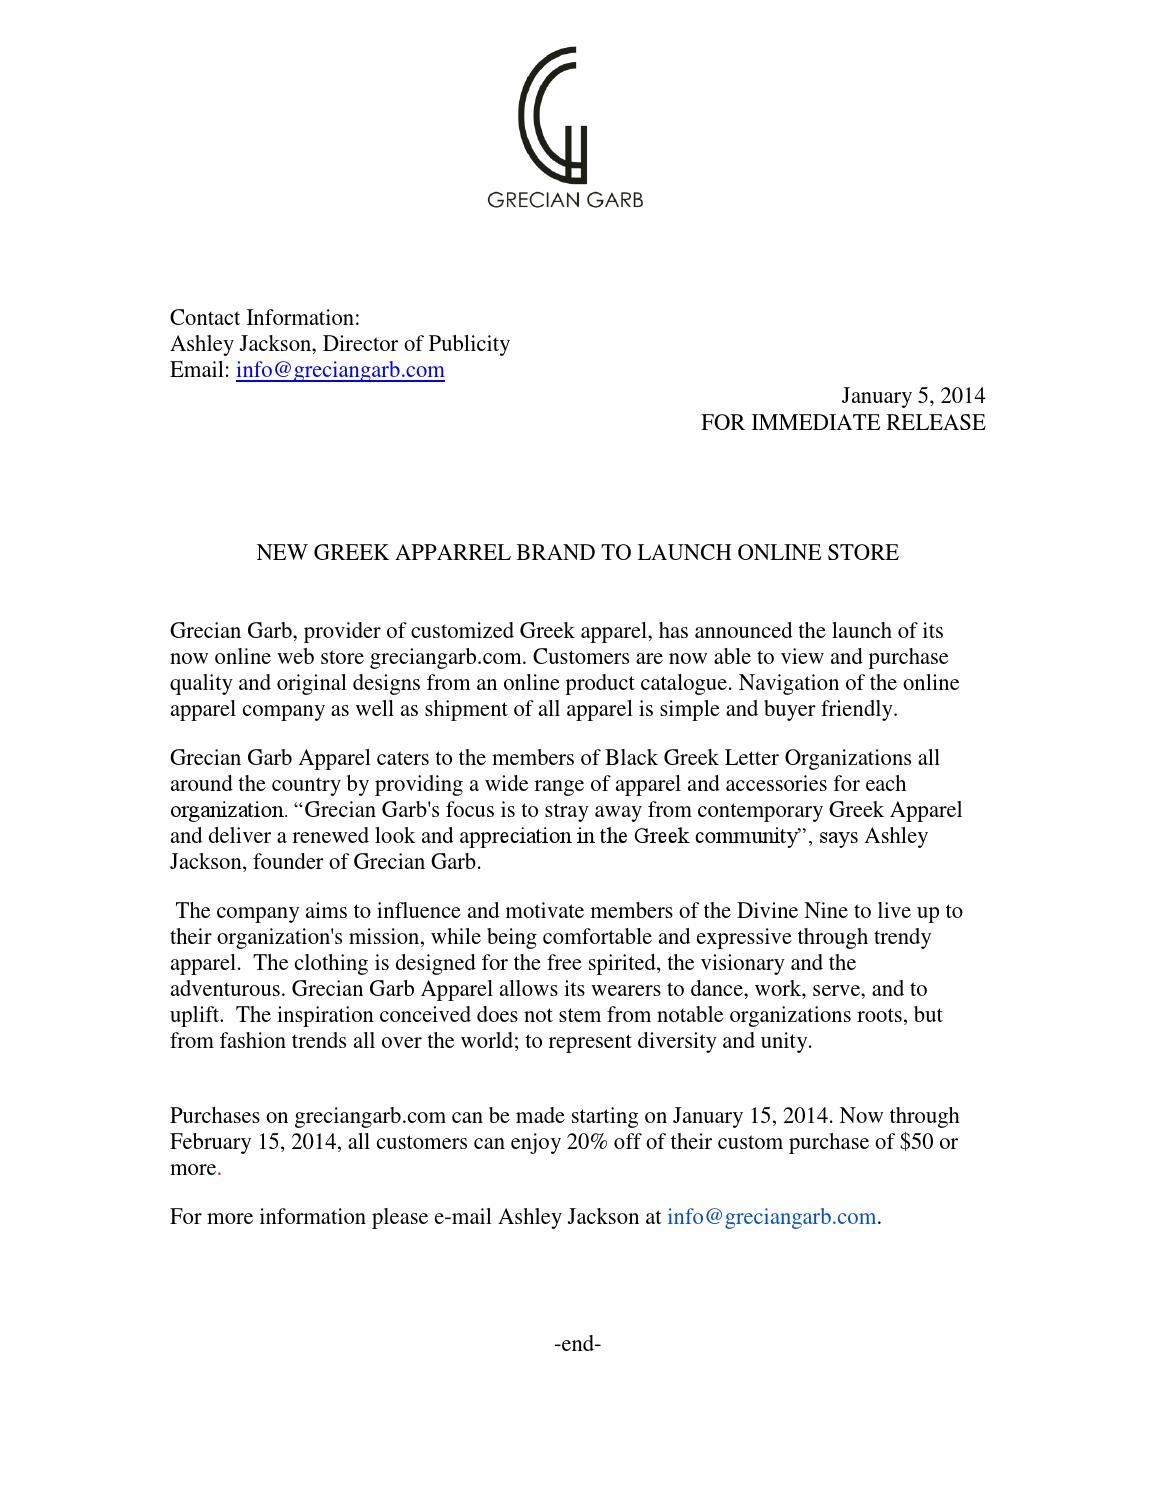 Grecain Garb Press Release by Gabrielle Stinnett - issuu